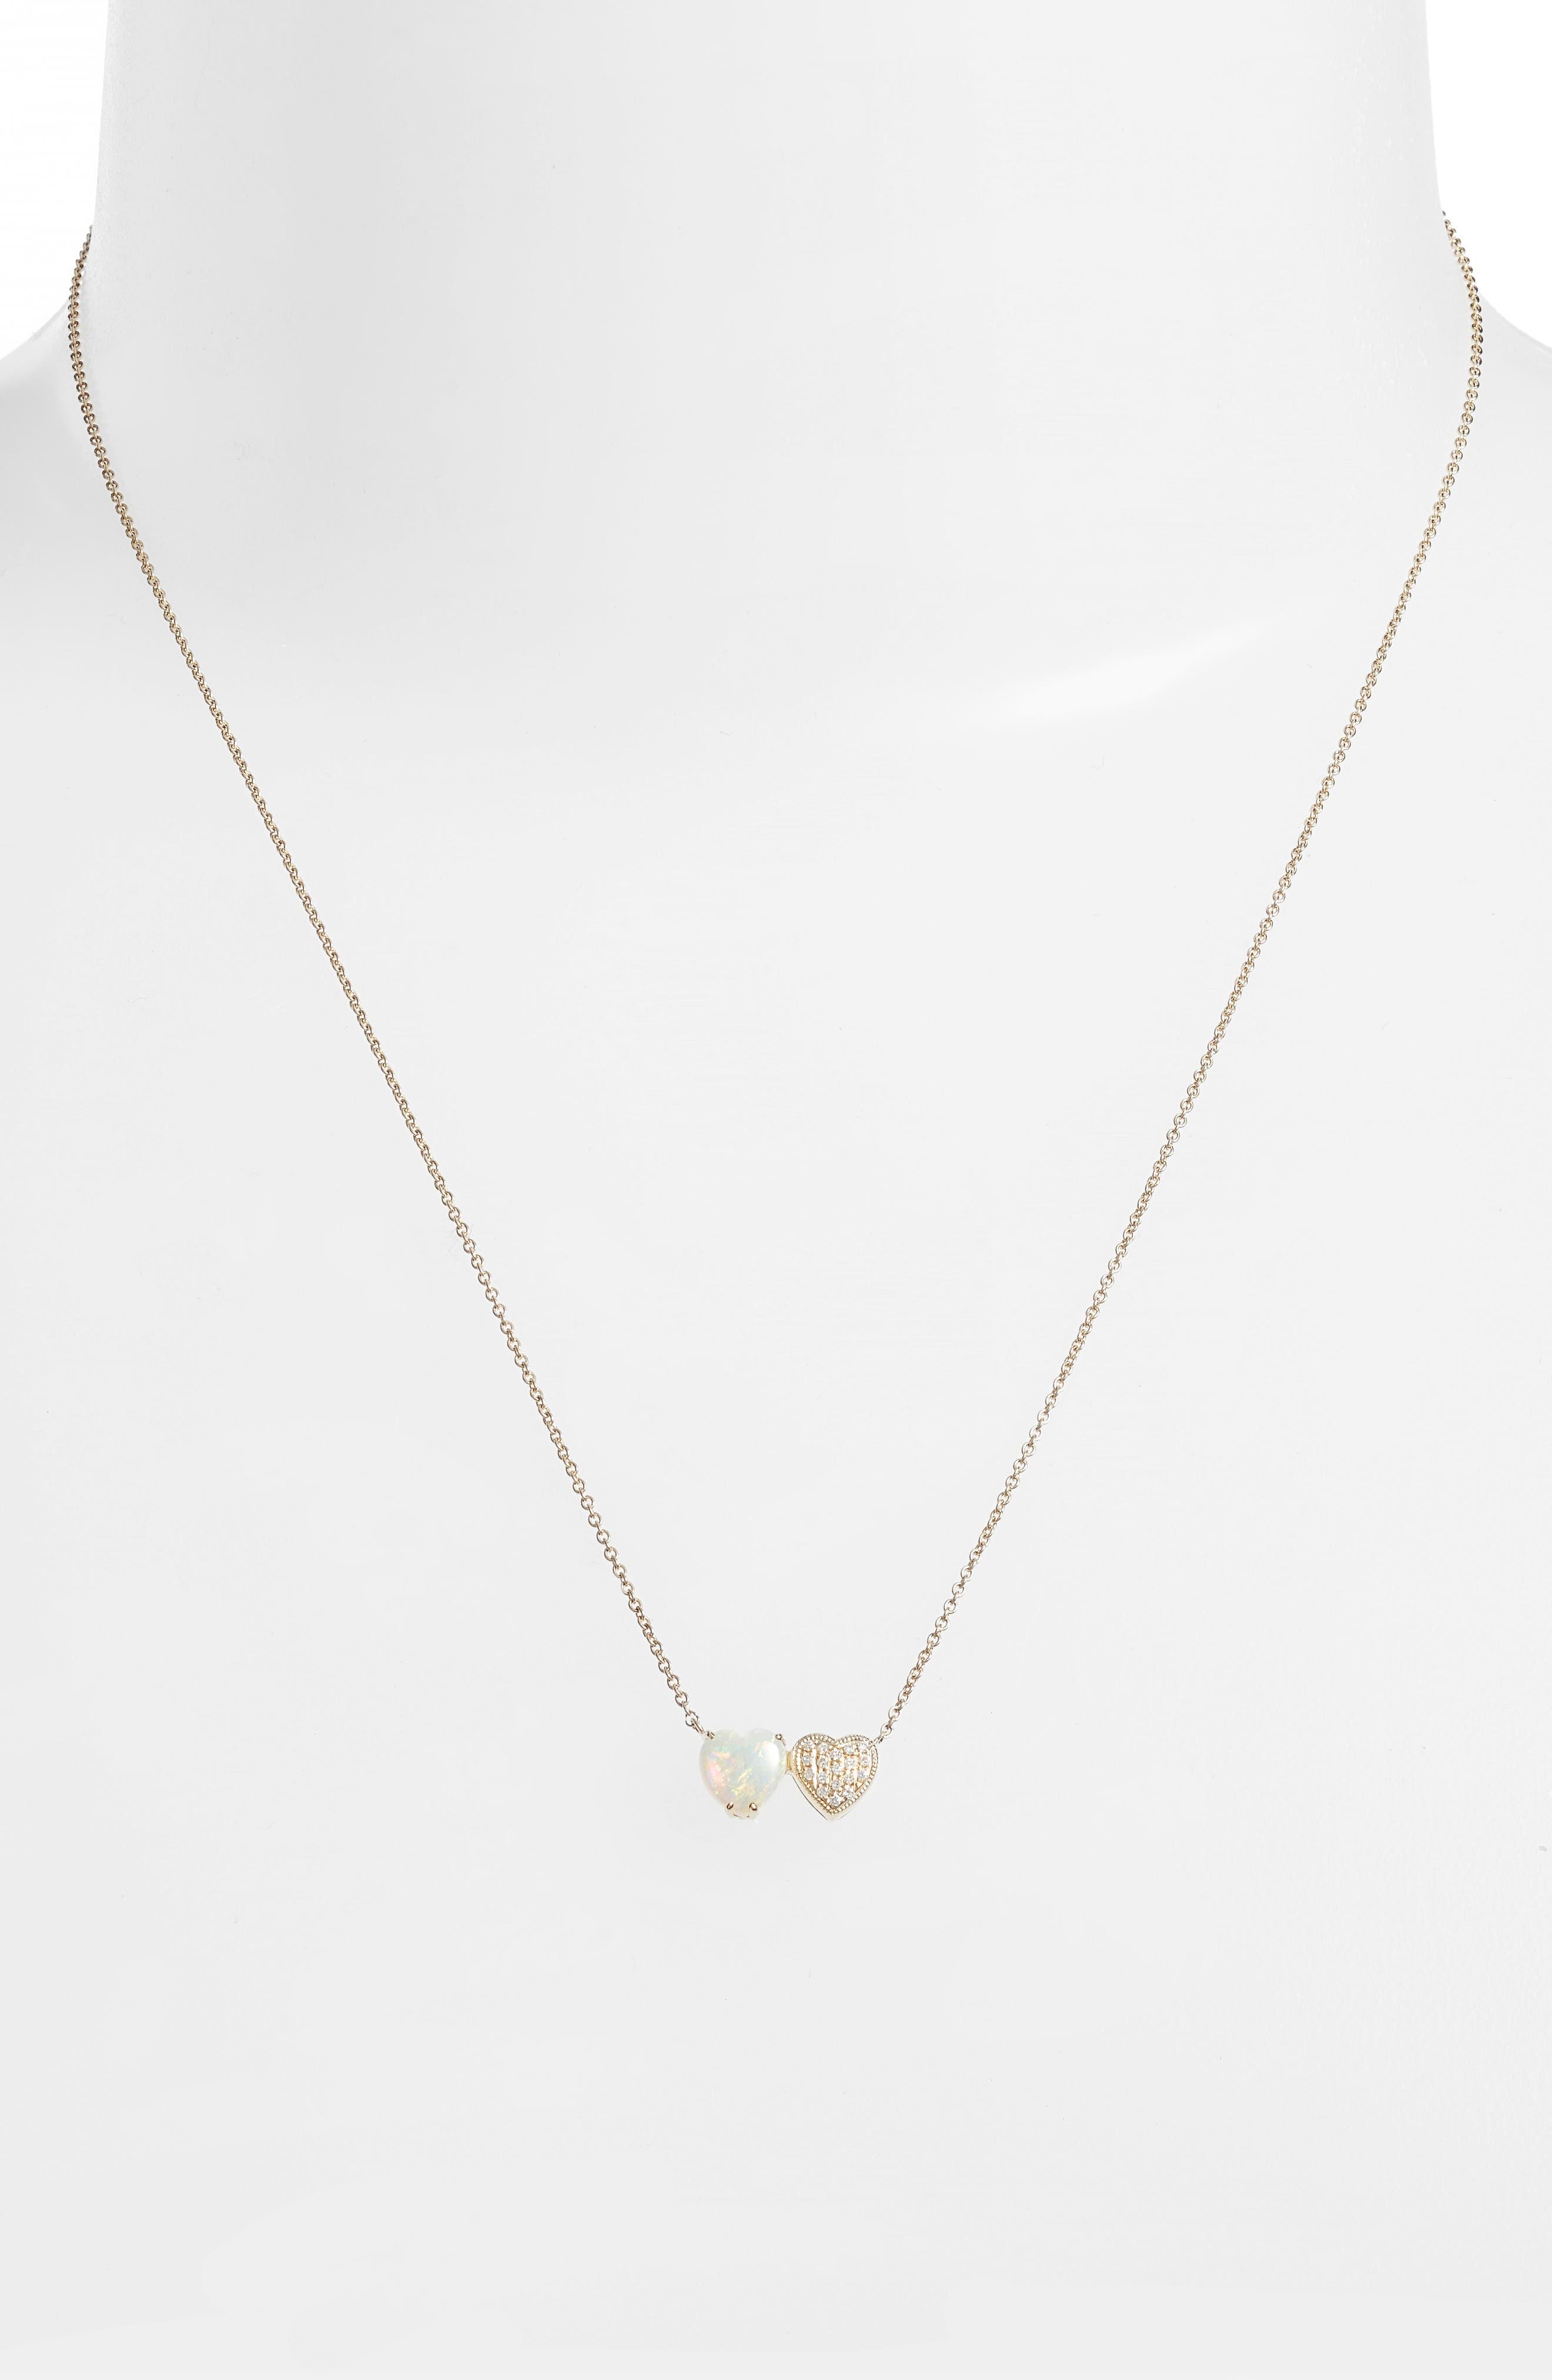 Semiprecious Stone & Diamond Pendant Necklace,                             Alternate thumbnail 2, color,                             YELLOW GOLD